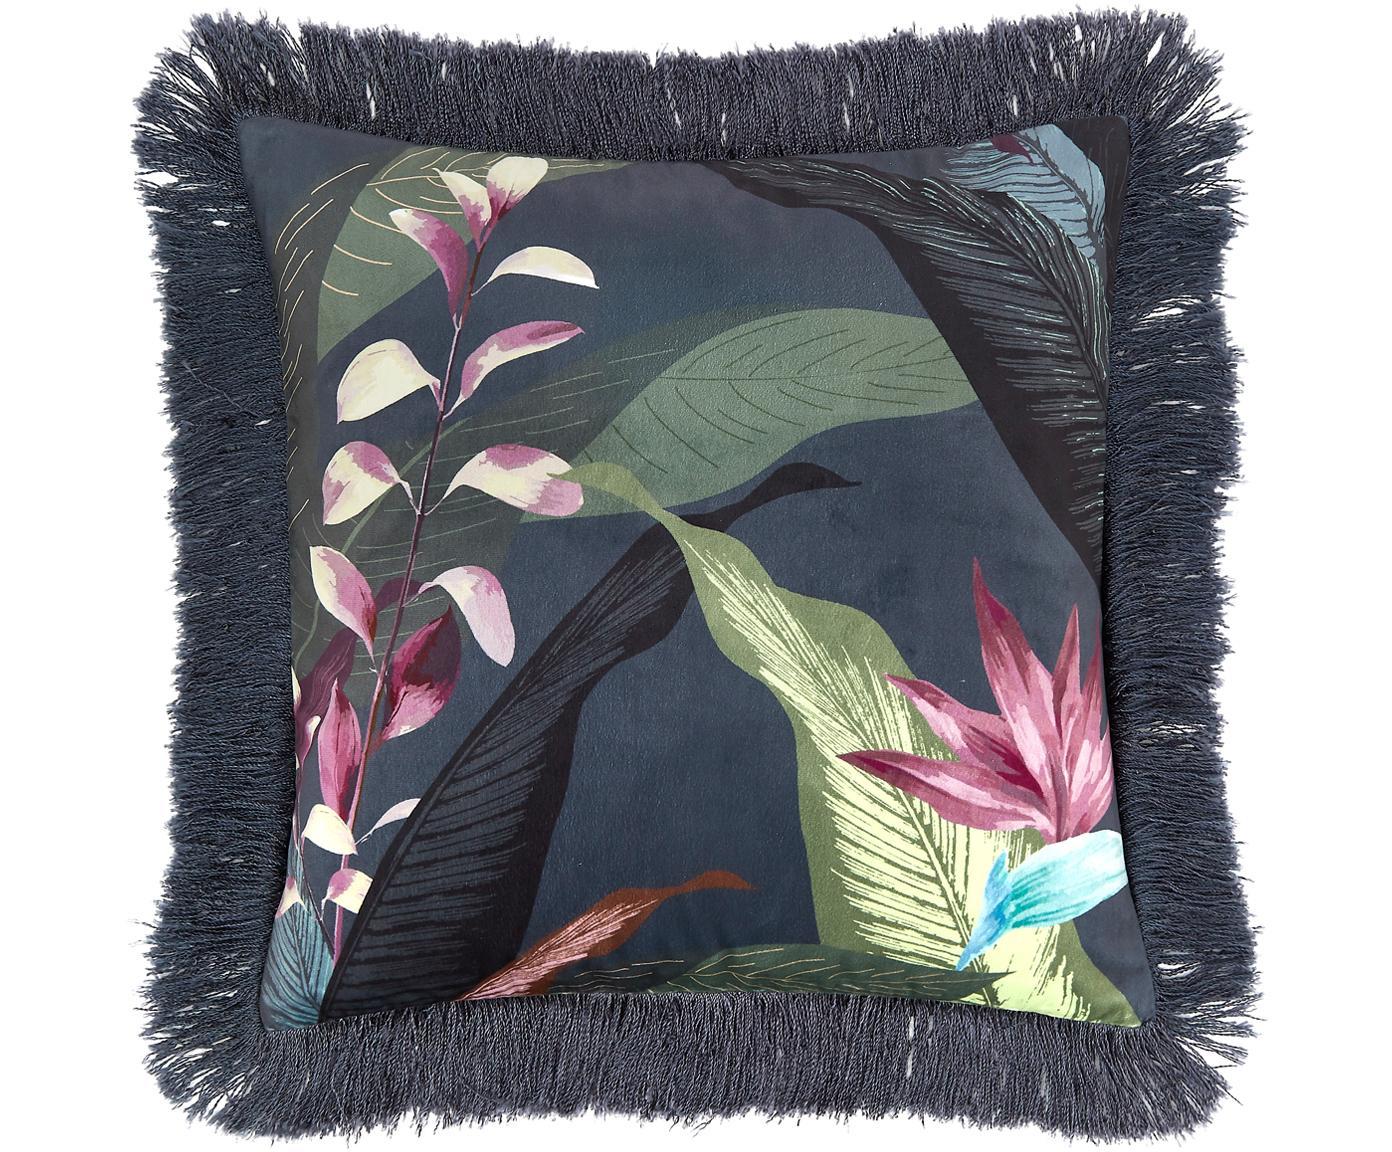 Funda de cojín de terciopelo con flecos Flora, Parte delantera: terciopelo de poliéster, Parte trasera: algodón, Flecos: viscosa, Multicolor, An 40 x L 40 cm